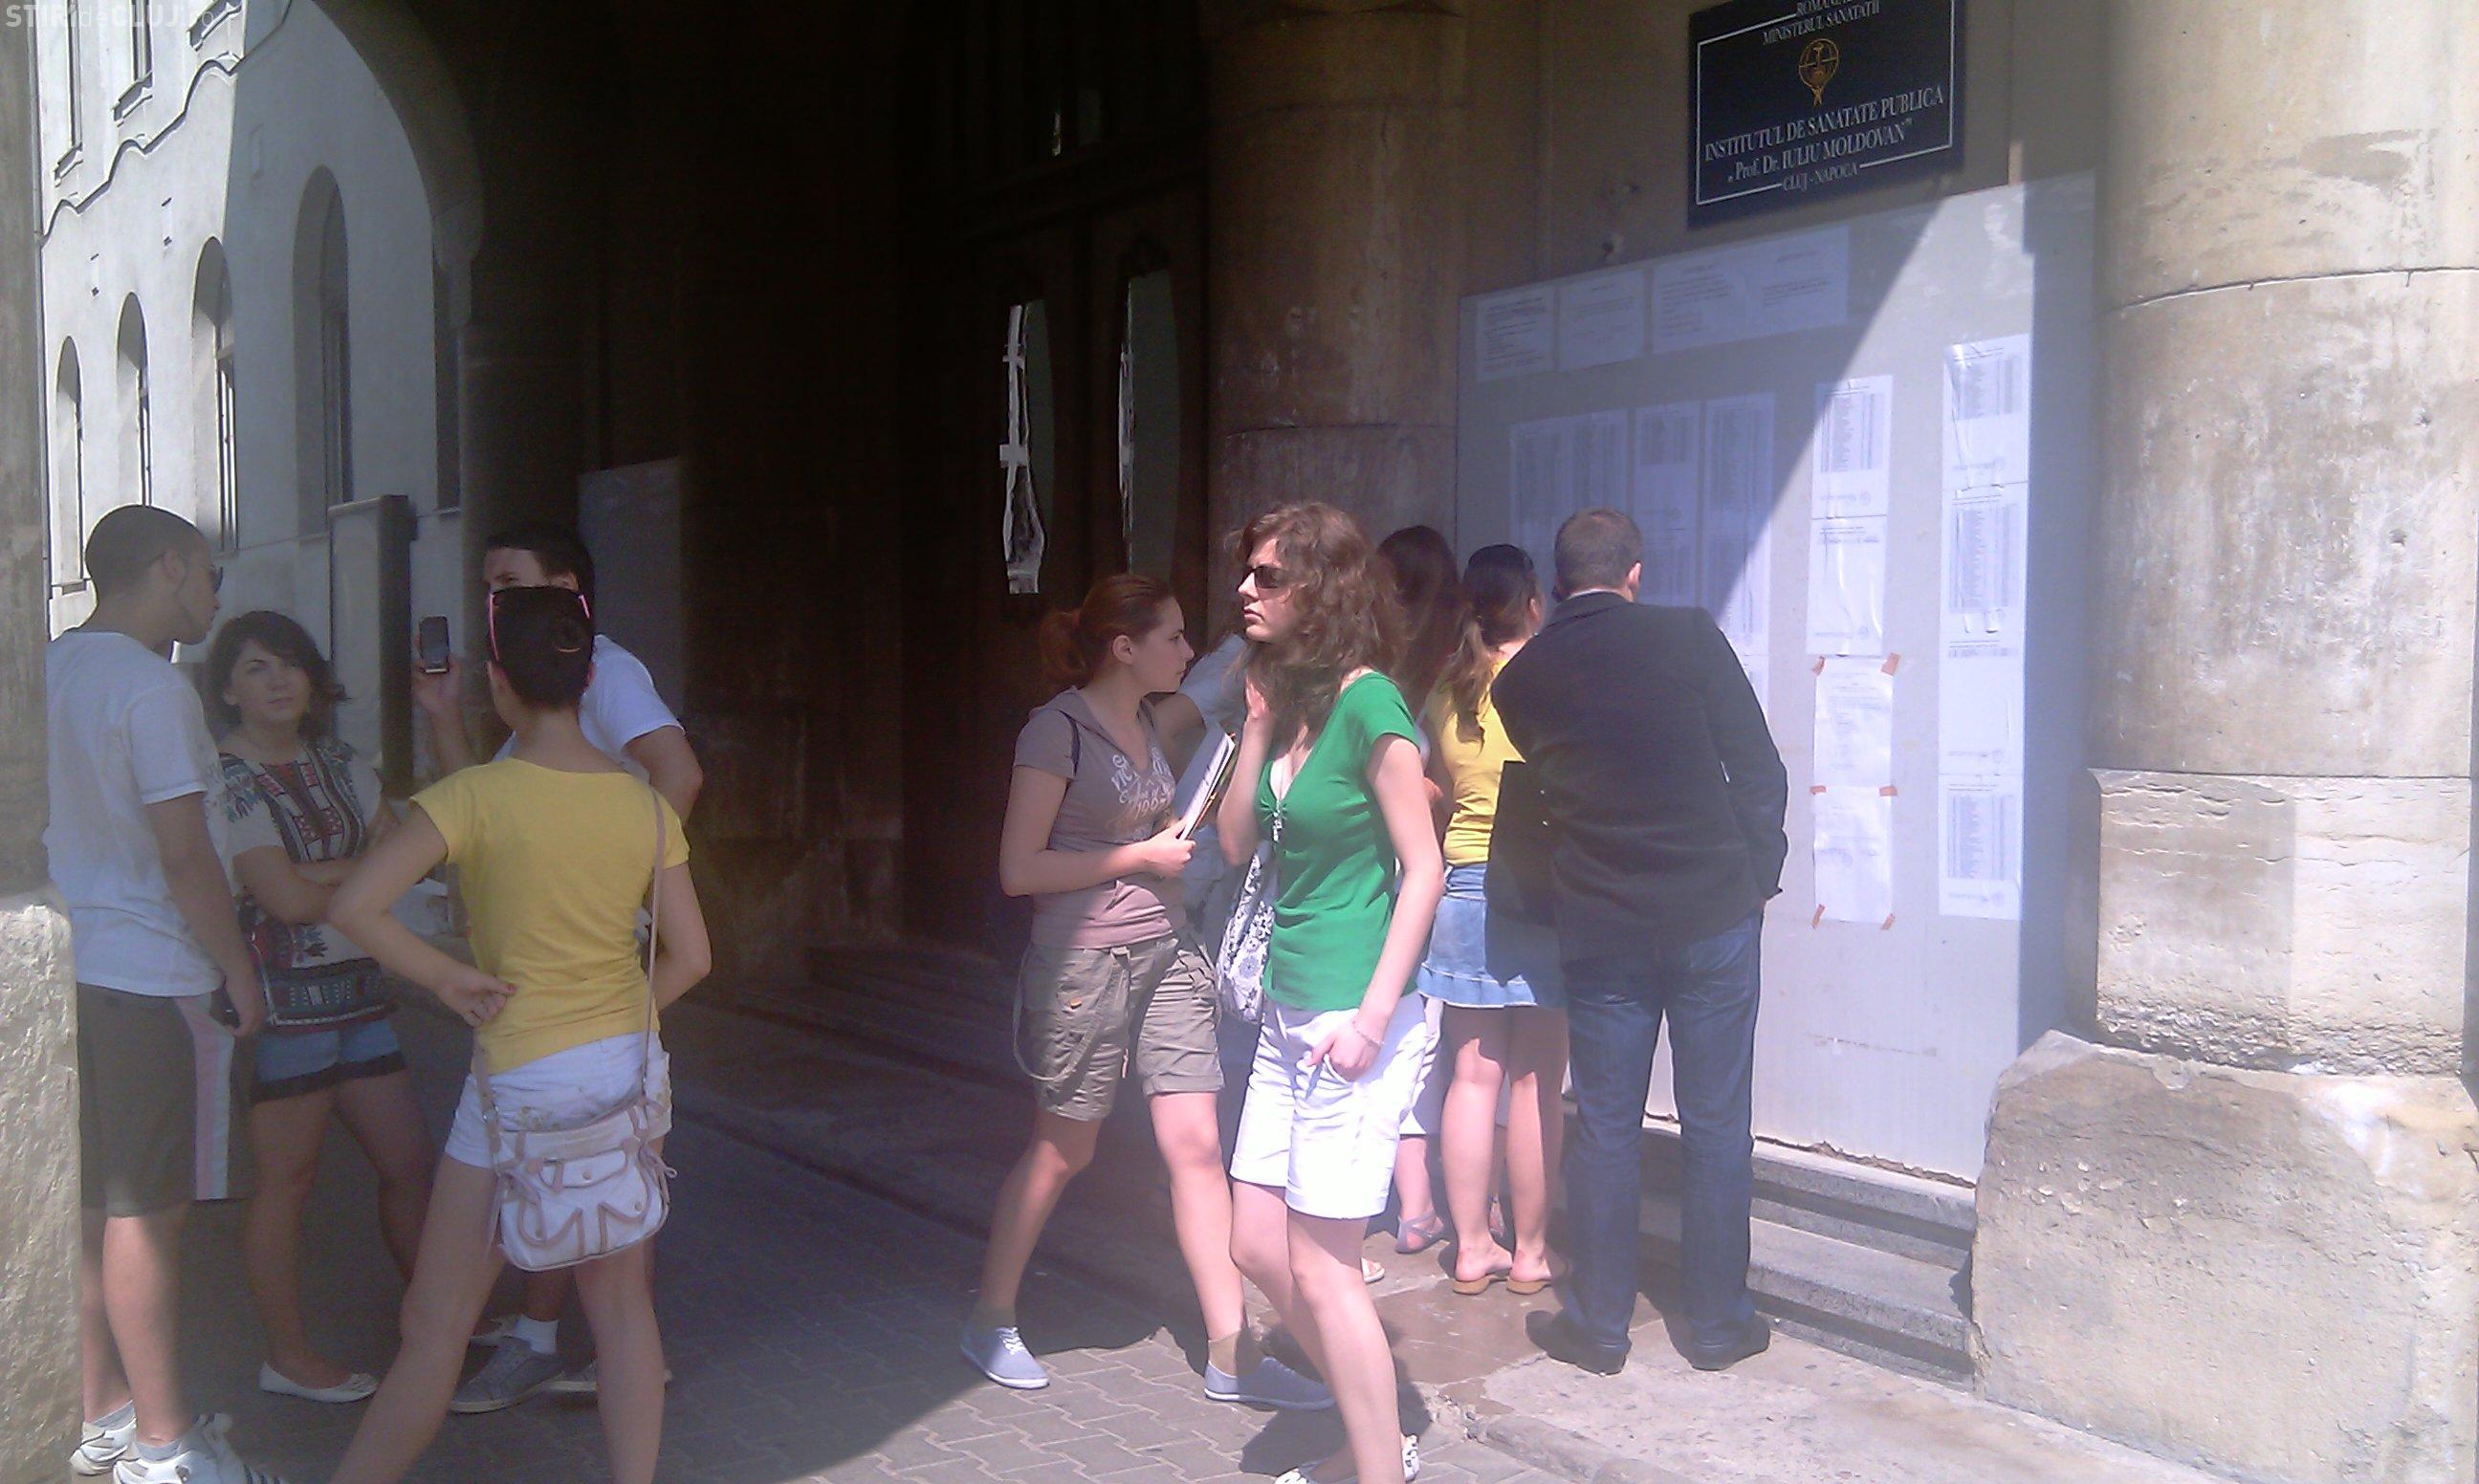 Admitere UMF Cluj 2011: Doi candidati pe un loc la examenul din 20 iulie